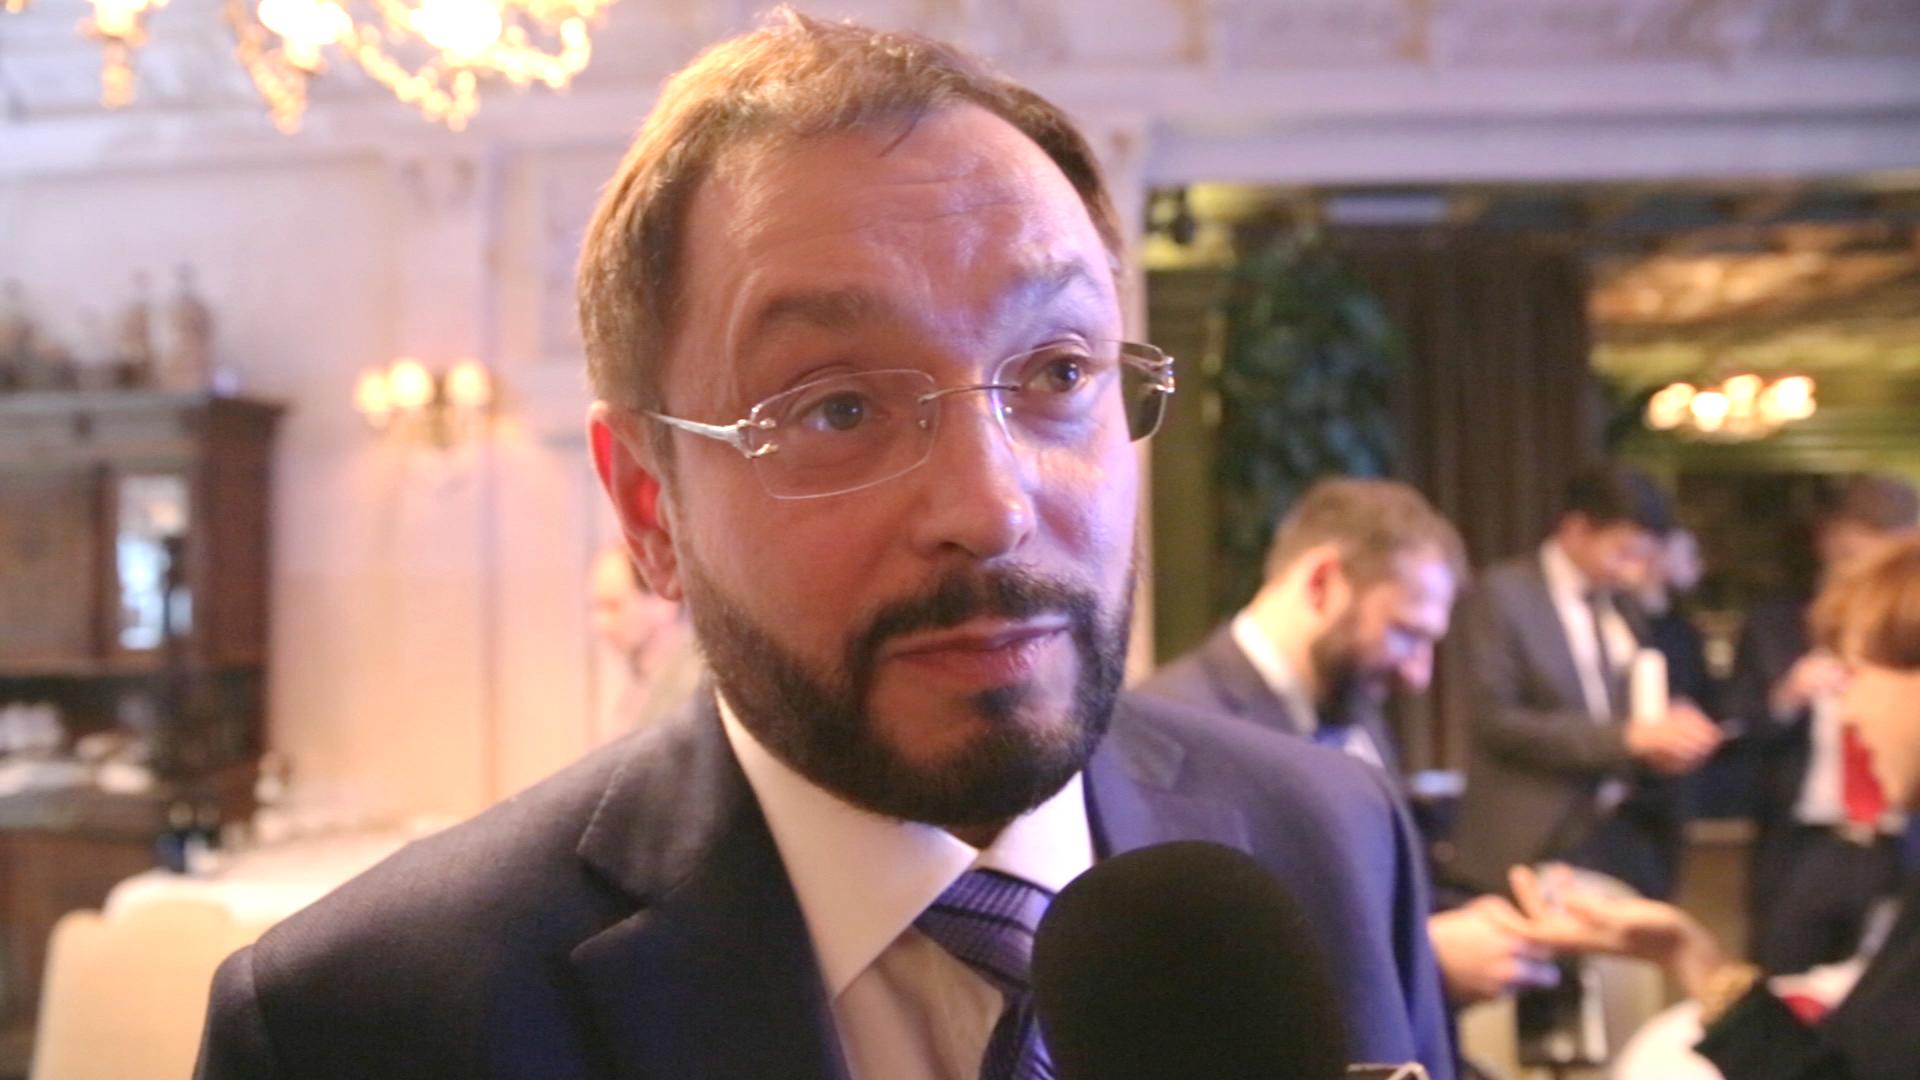 Глеб Фетисов, частный инвестор, №80 Forbes $1,2 млрд